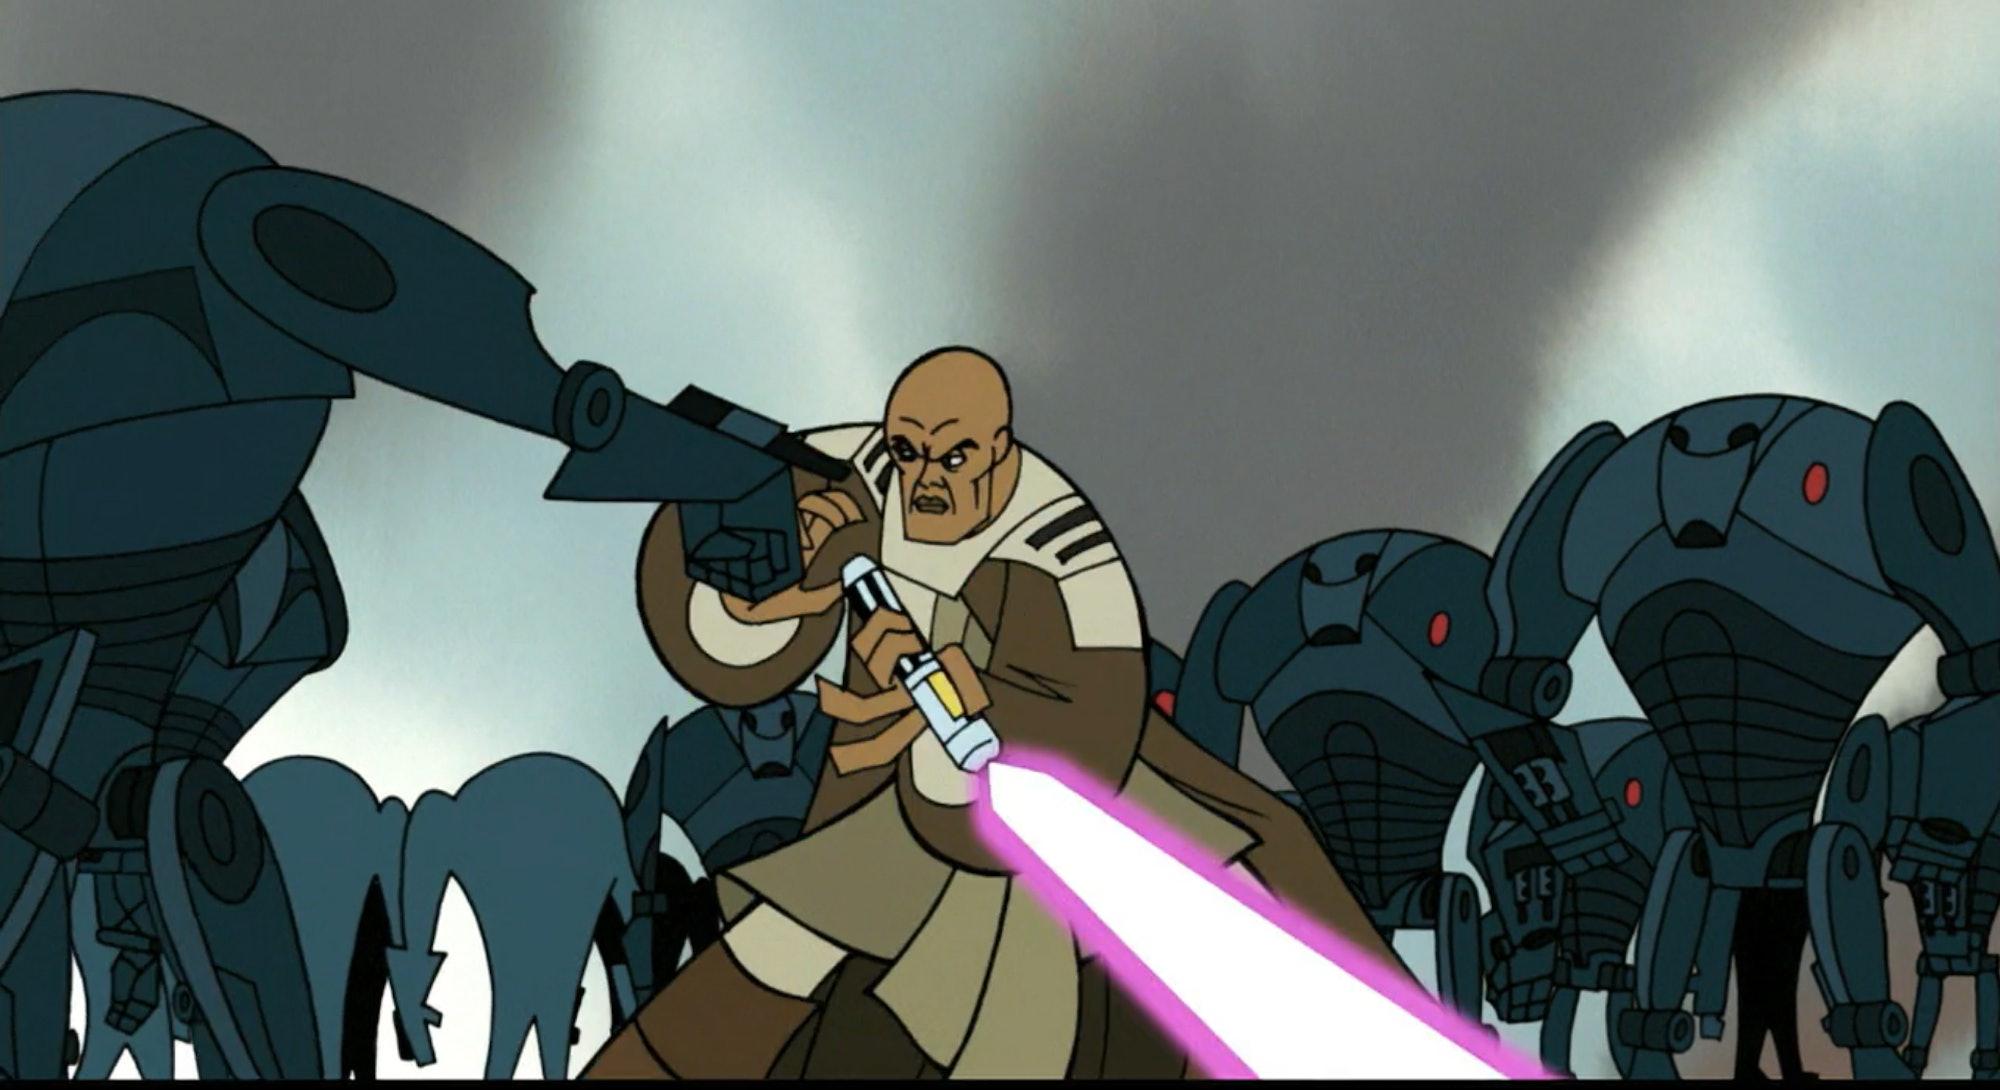 mace windu fighting droids in star wars clone wars screenshot